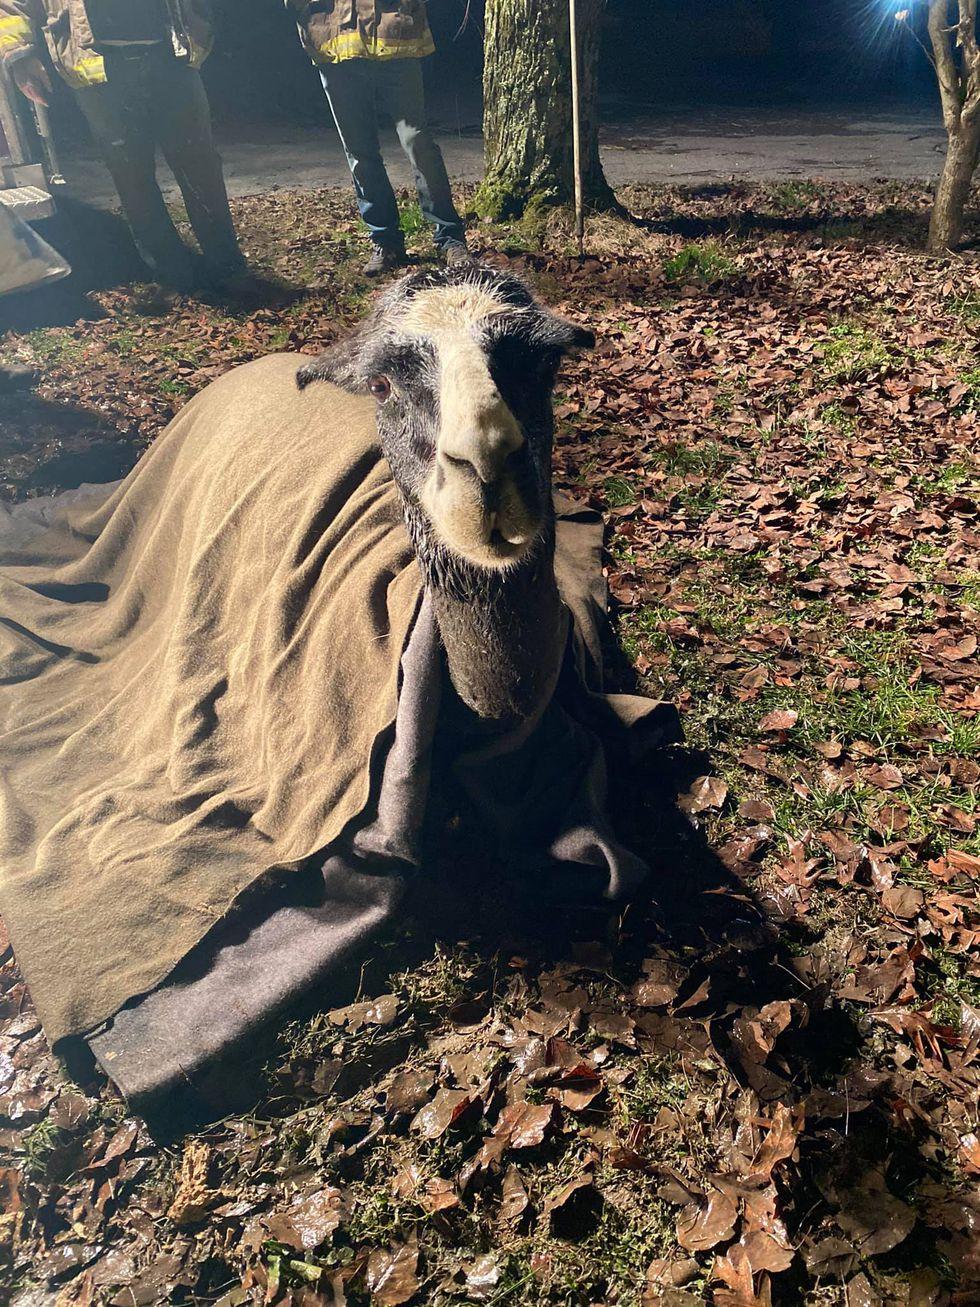 Alex the llama stuck in a septic tank